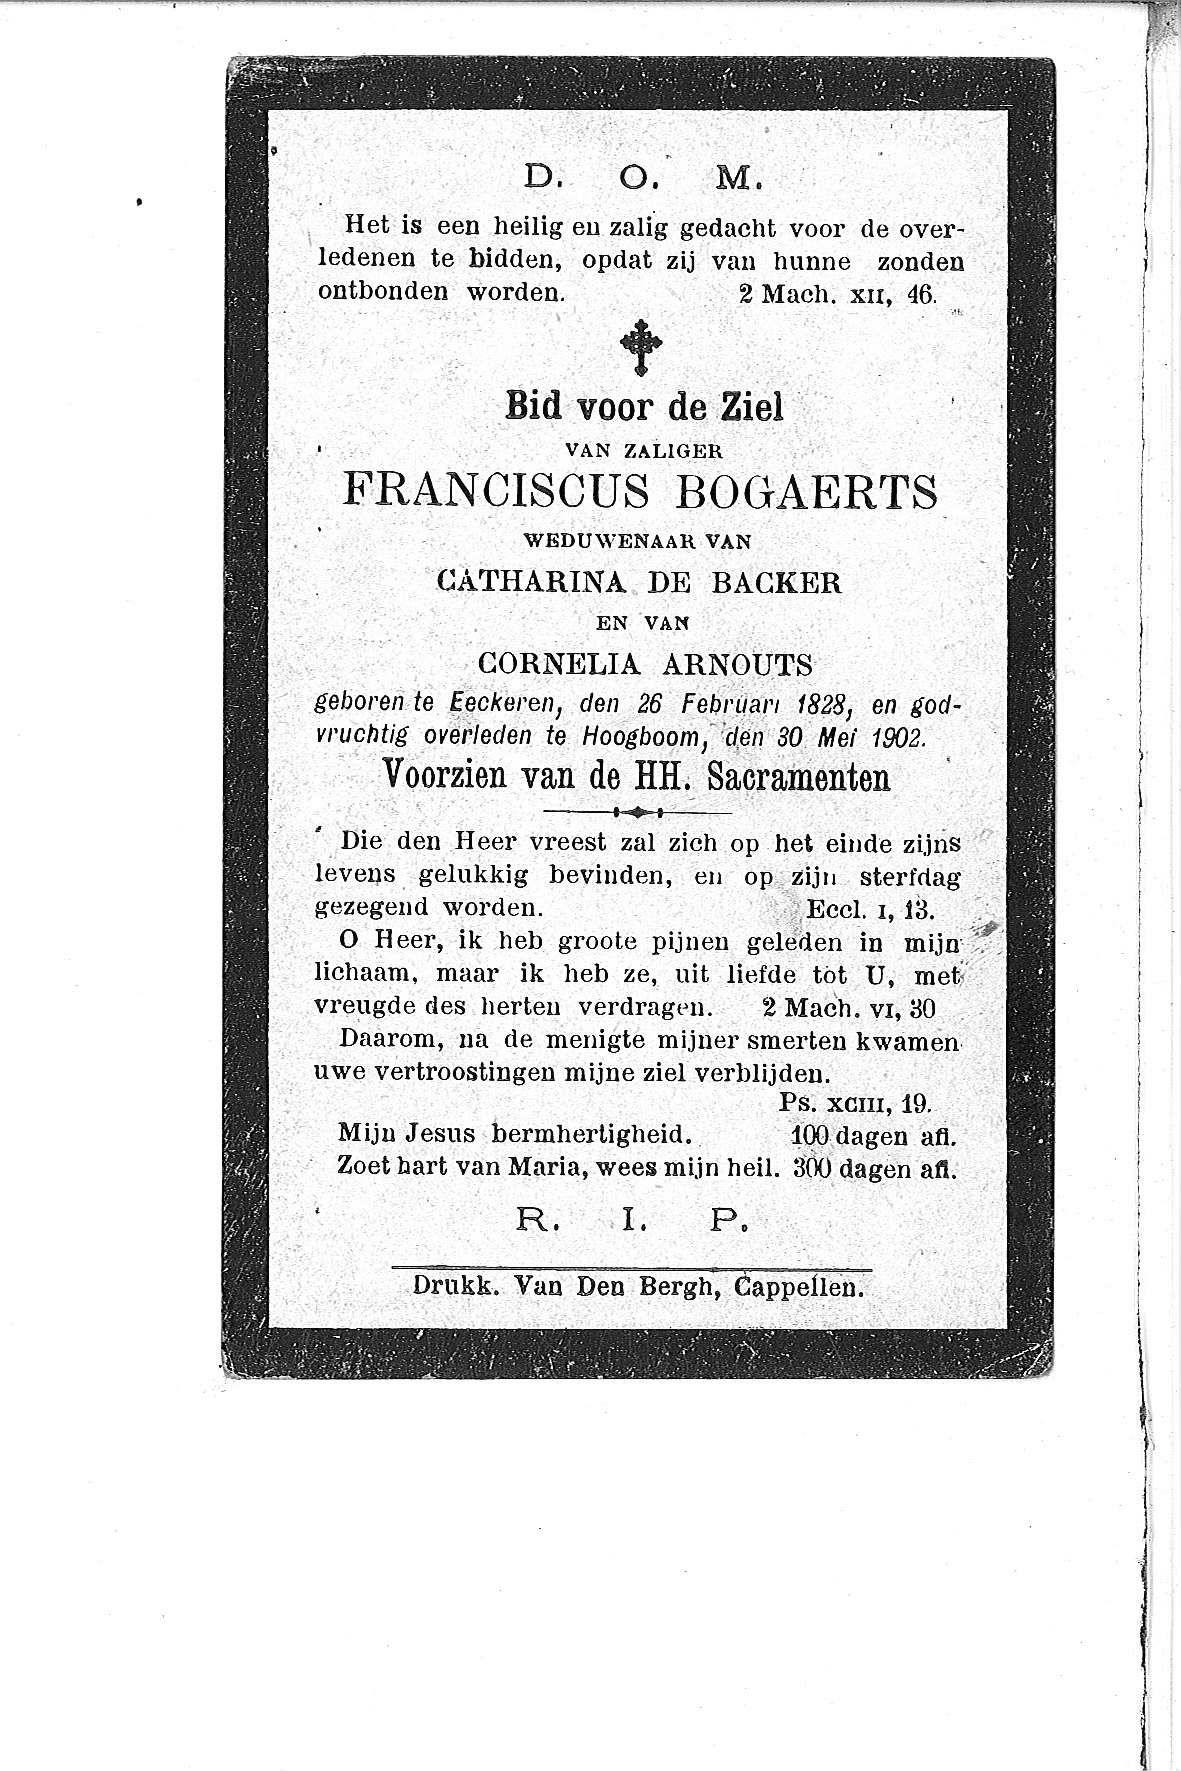 Franciscus(1902)20110318084748_00014.jpg